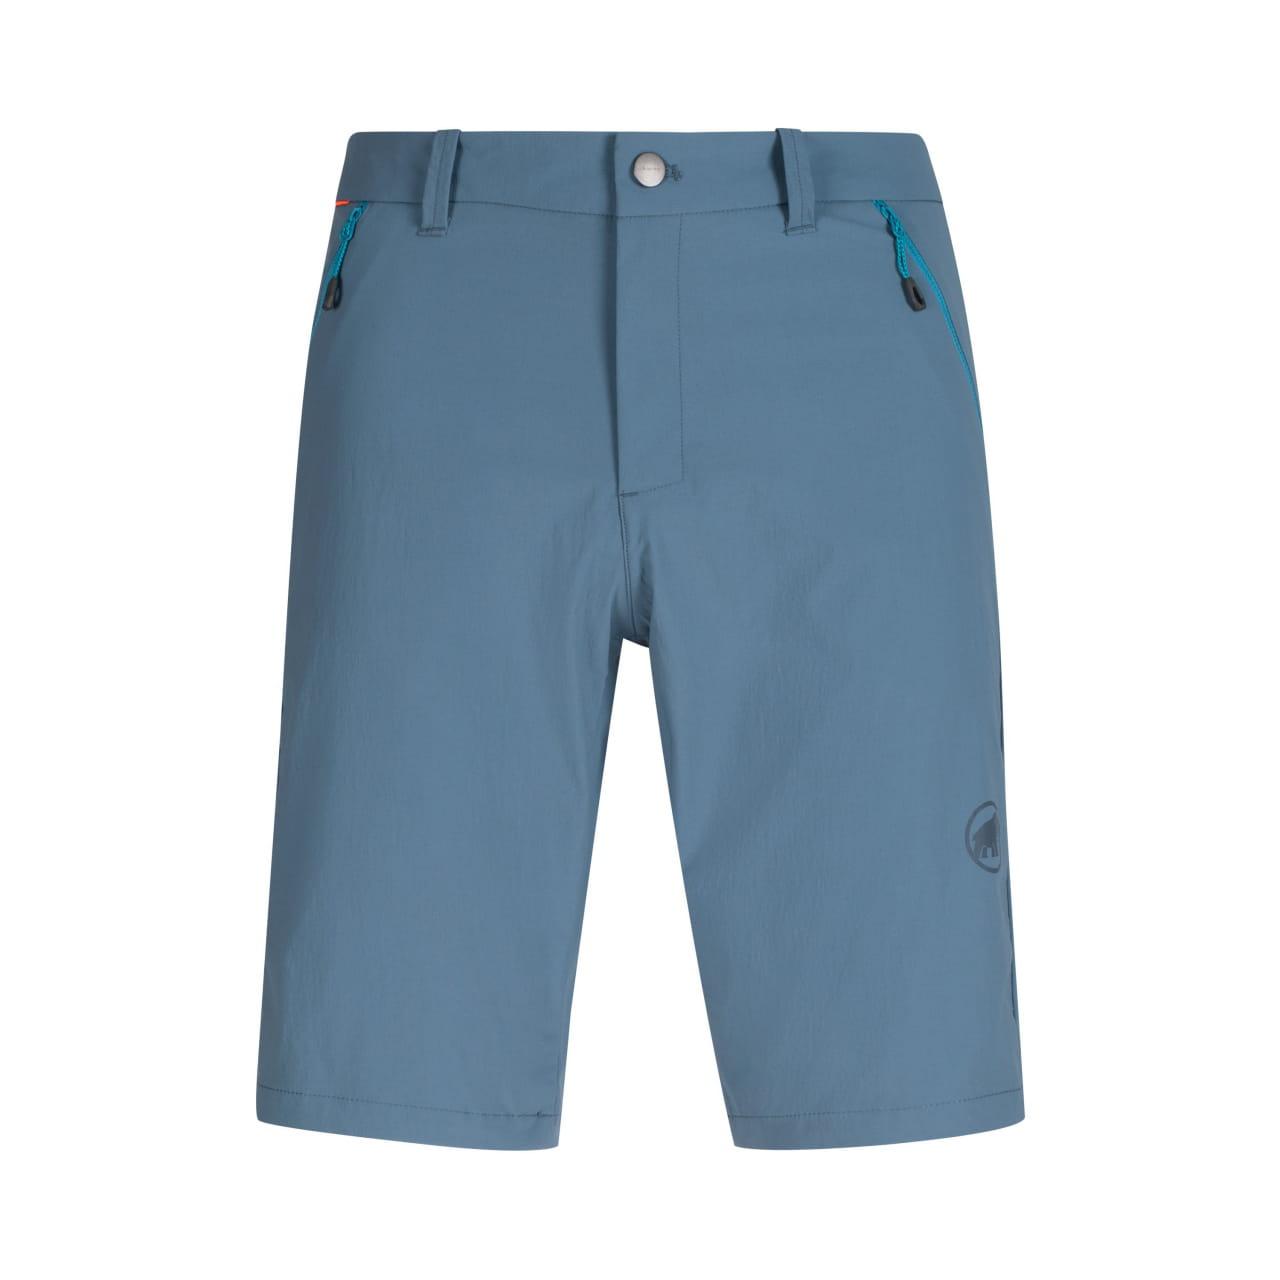 Pánské kraťasy Mammut Hiking Shorts Men